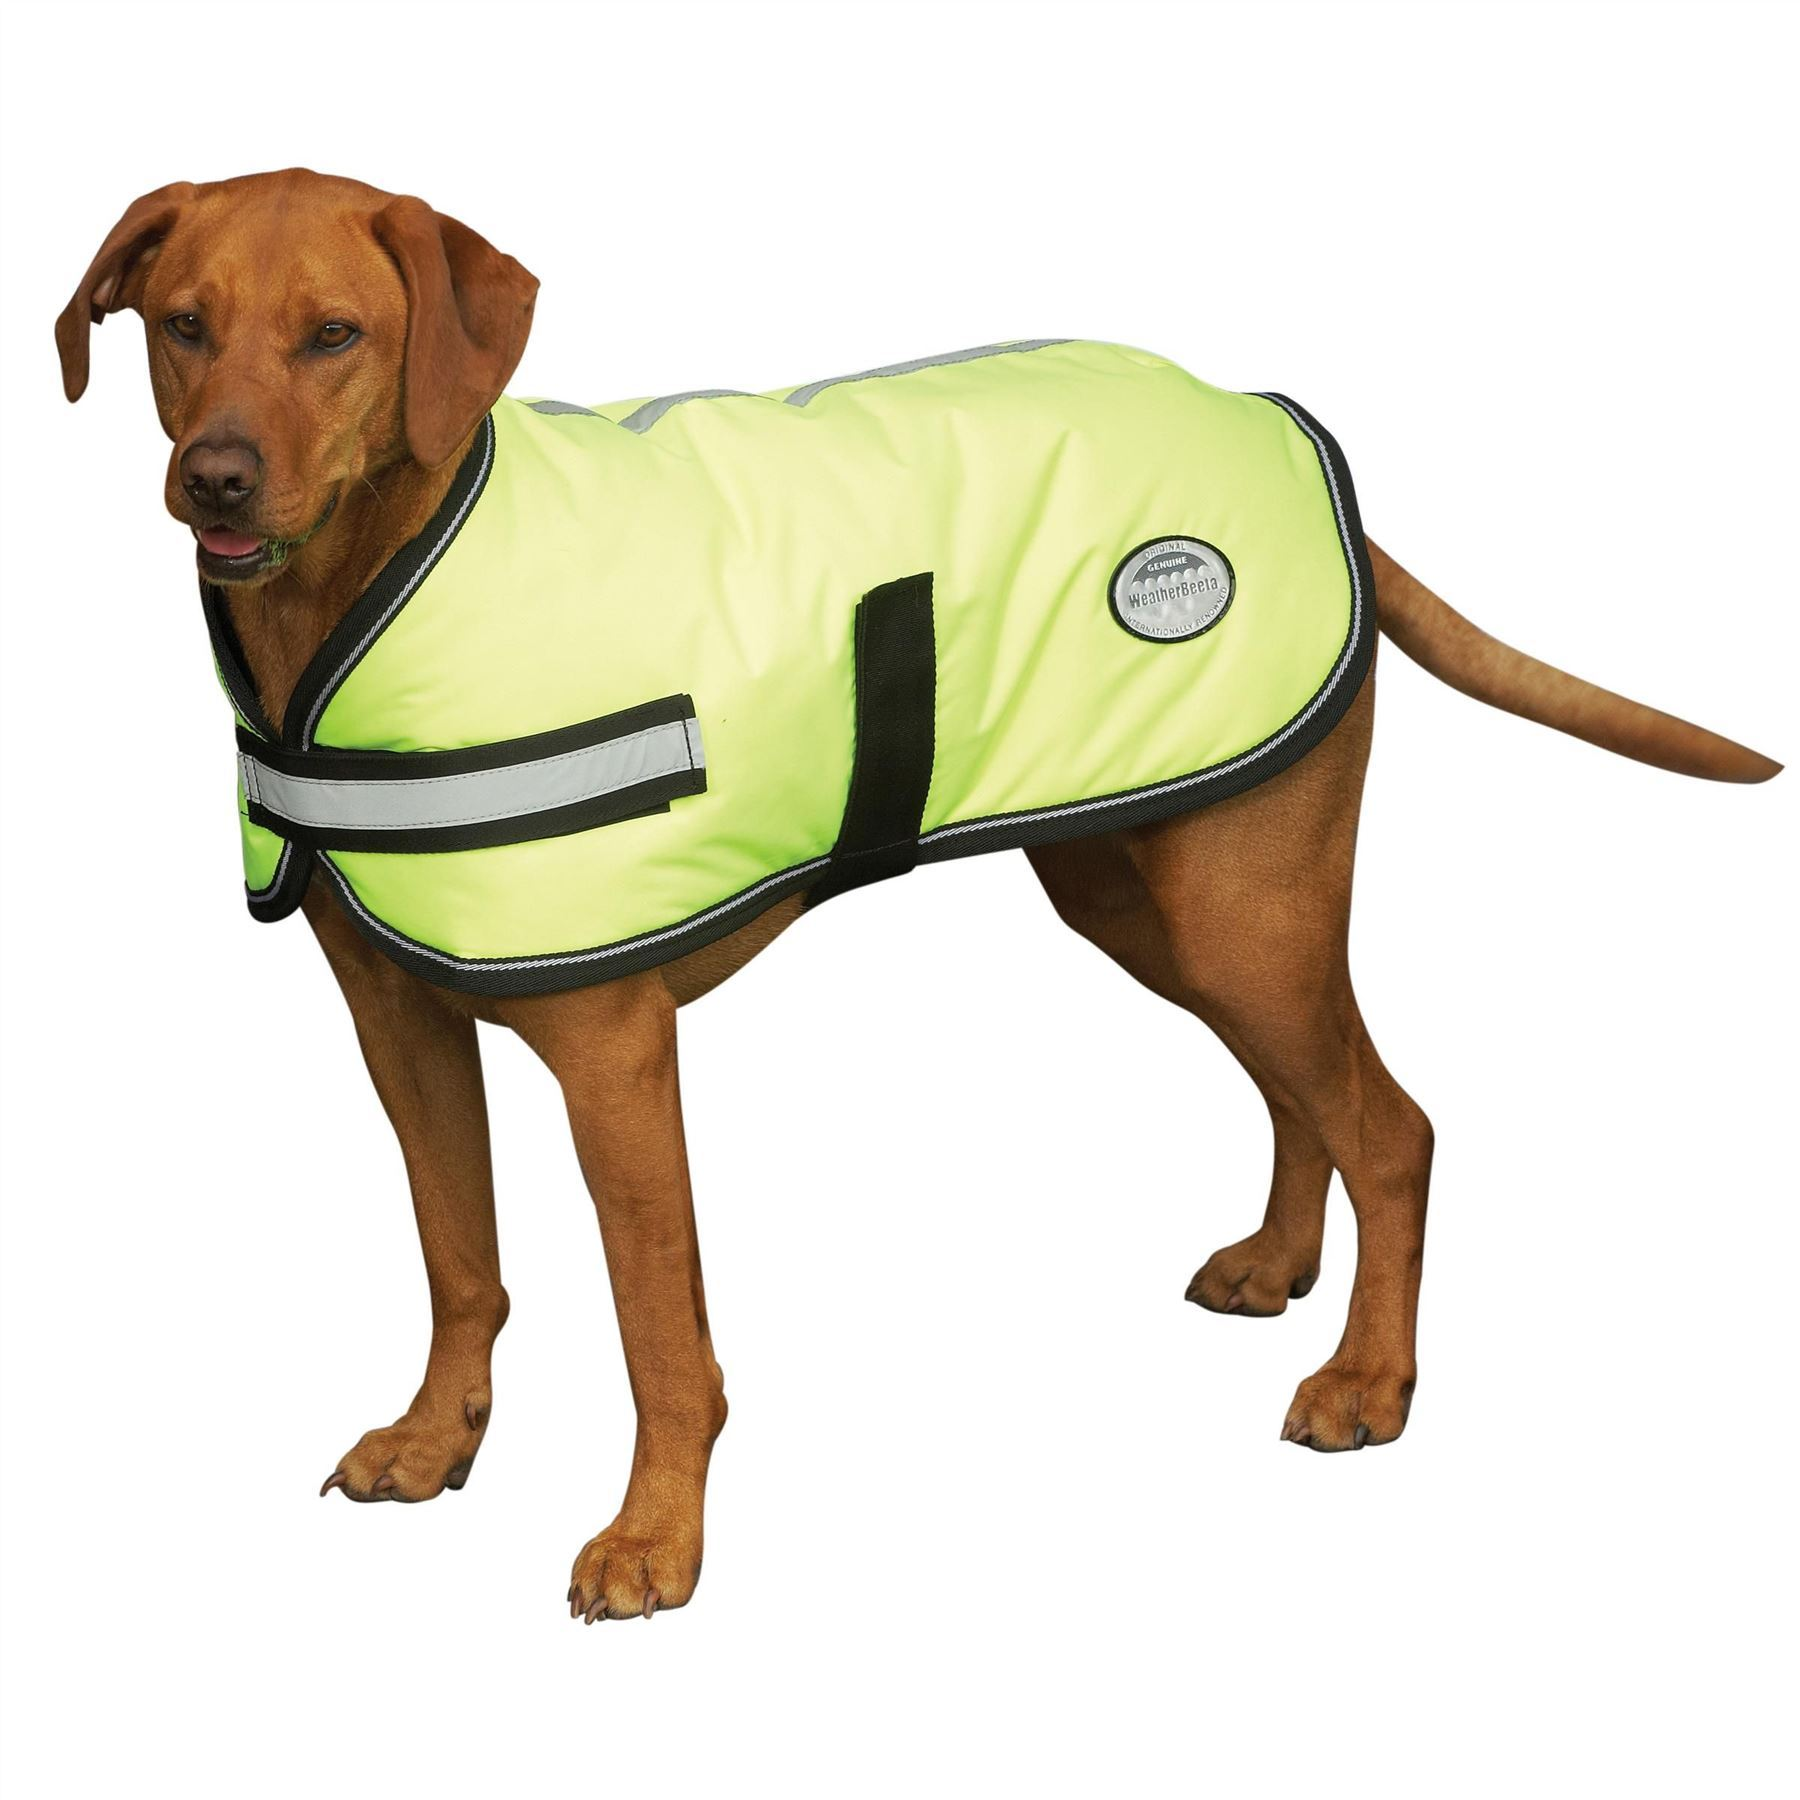 Weatherbeeta-Reflective-Hi-Vis-Parka-300D-Dernier-Dog-Coat-Waterproof-Breathable